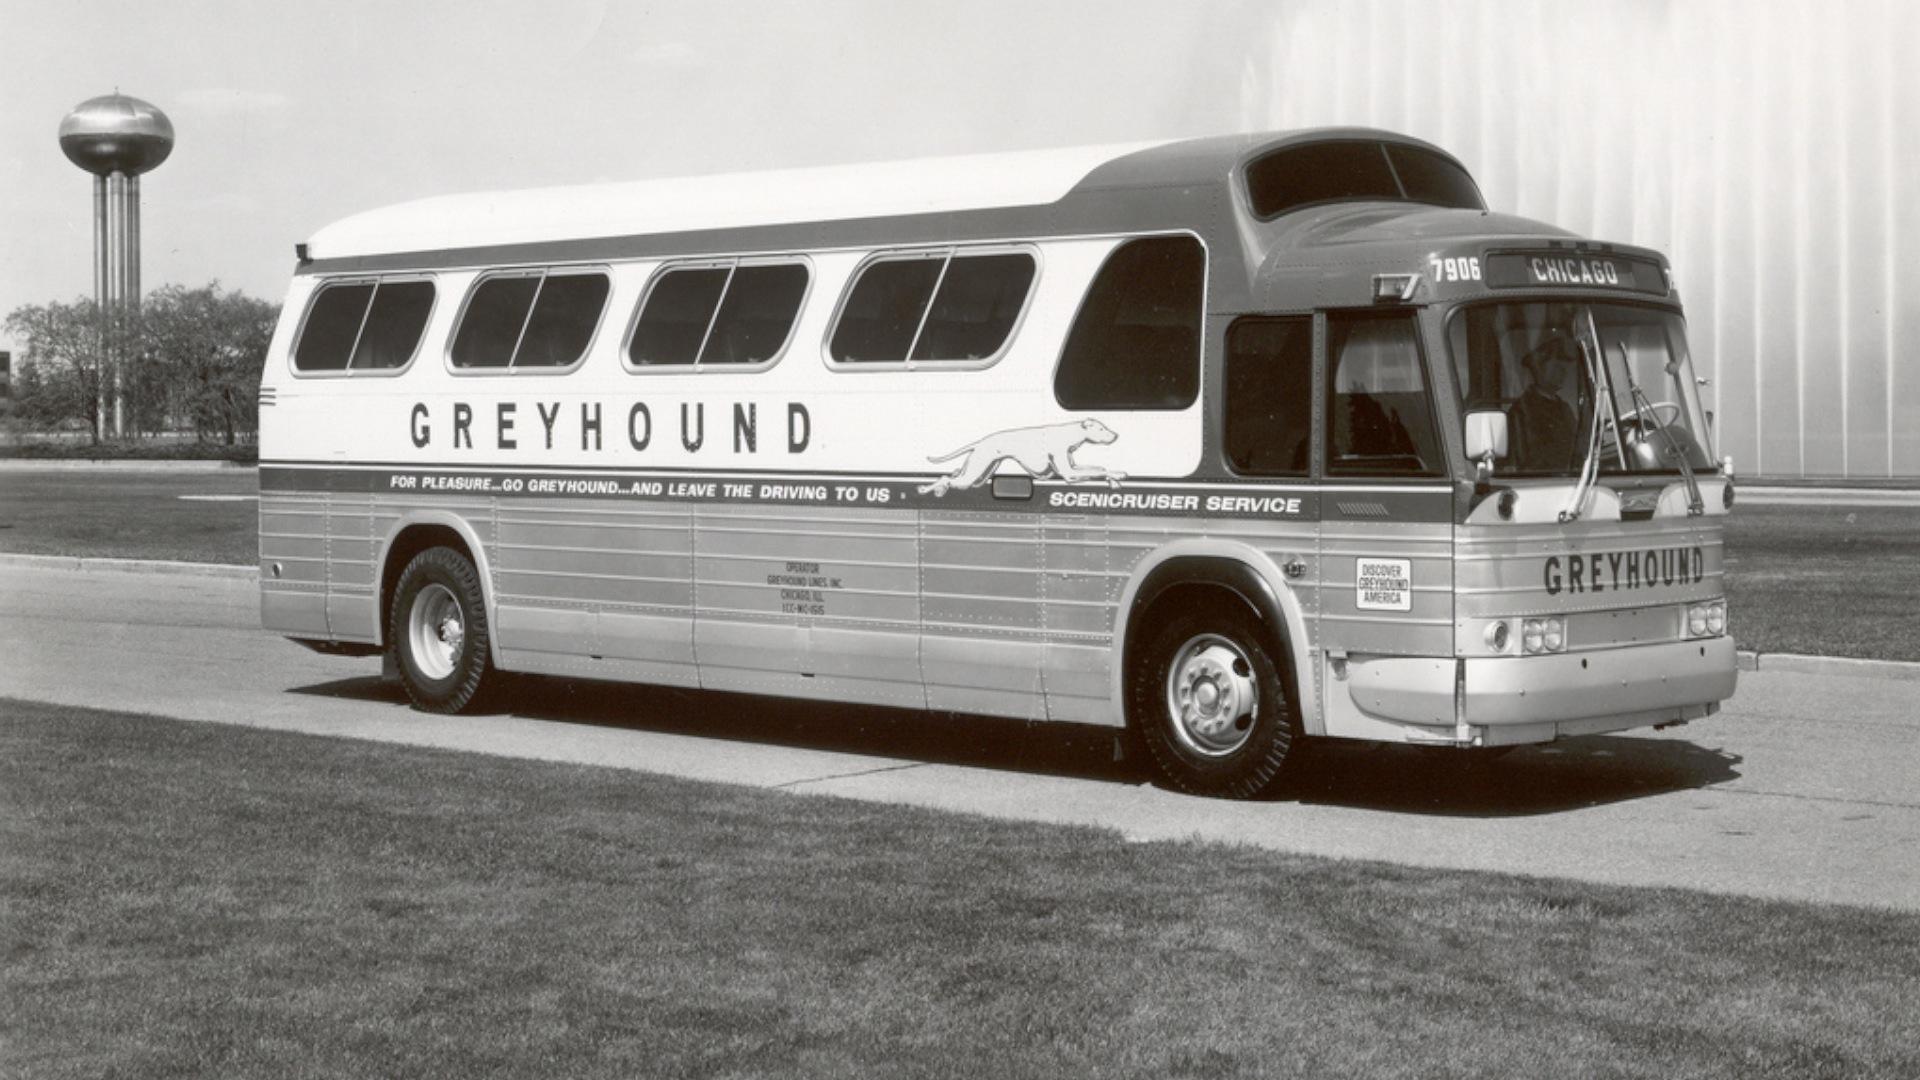 Greyhound bus turns 100